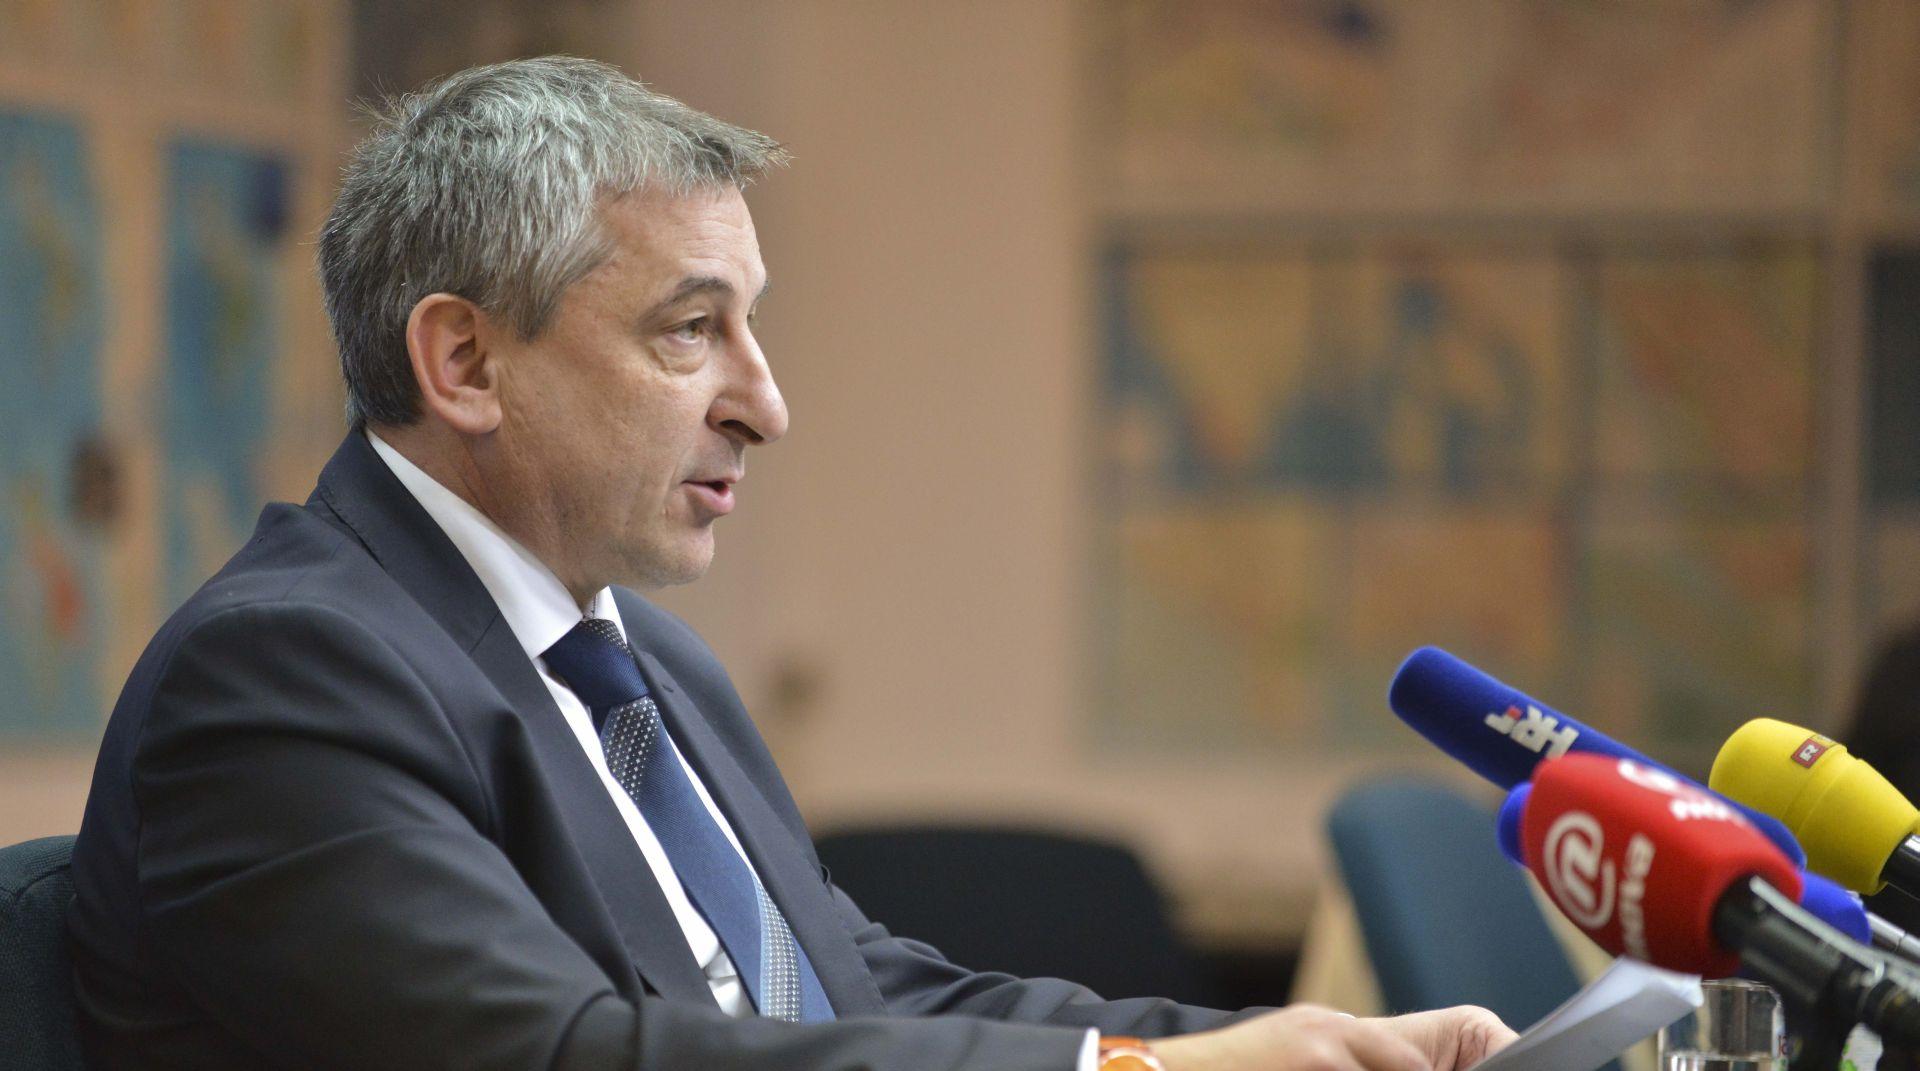 NEPRAVOMOĆNO Potpredsjednik Plenkovićeve vlade Štromar – kriv!